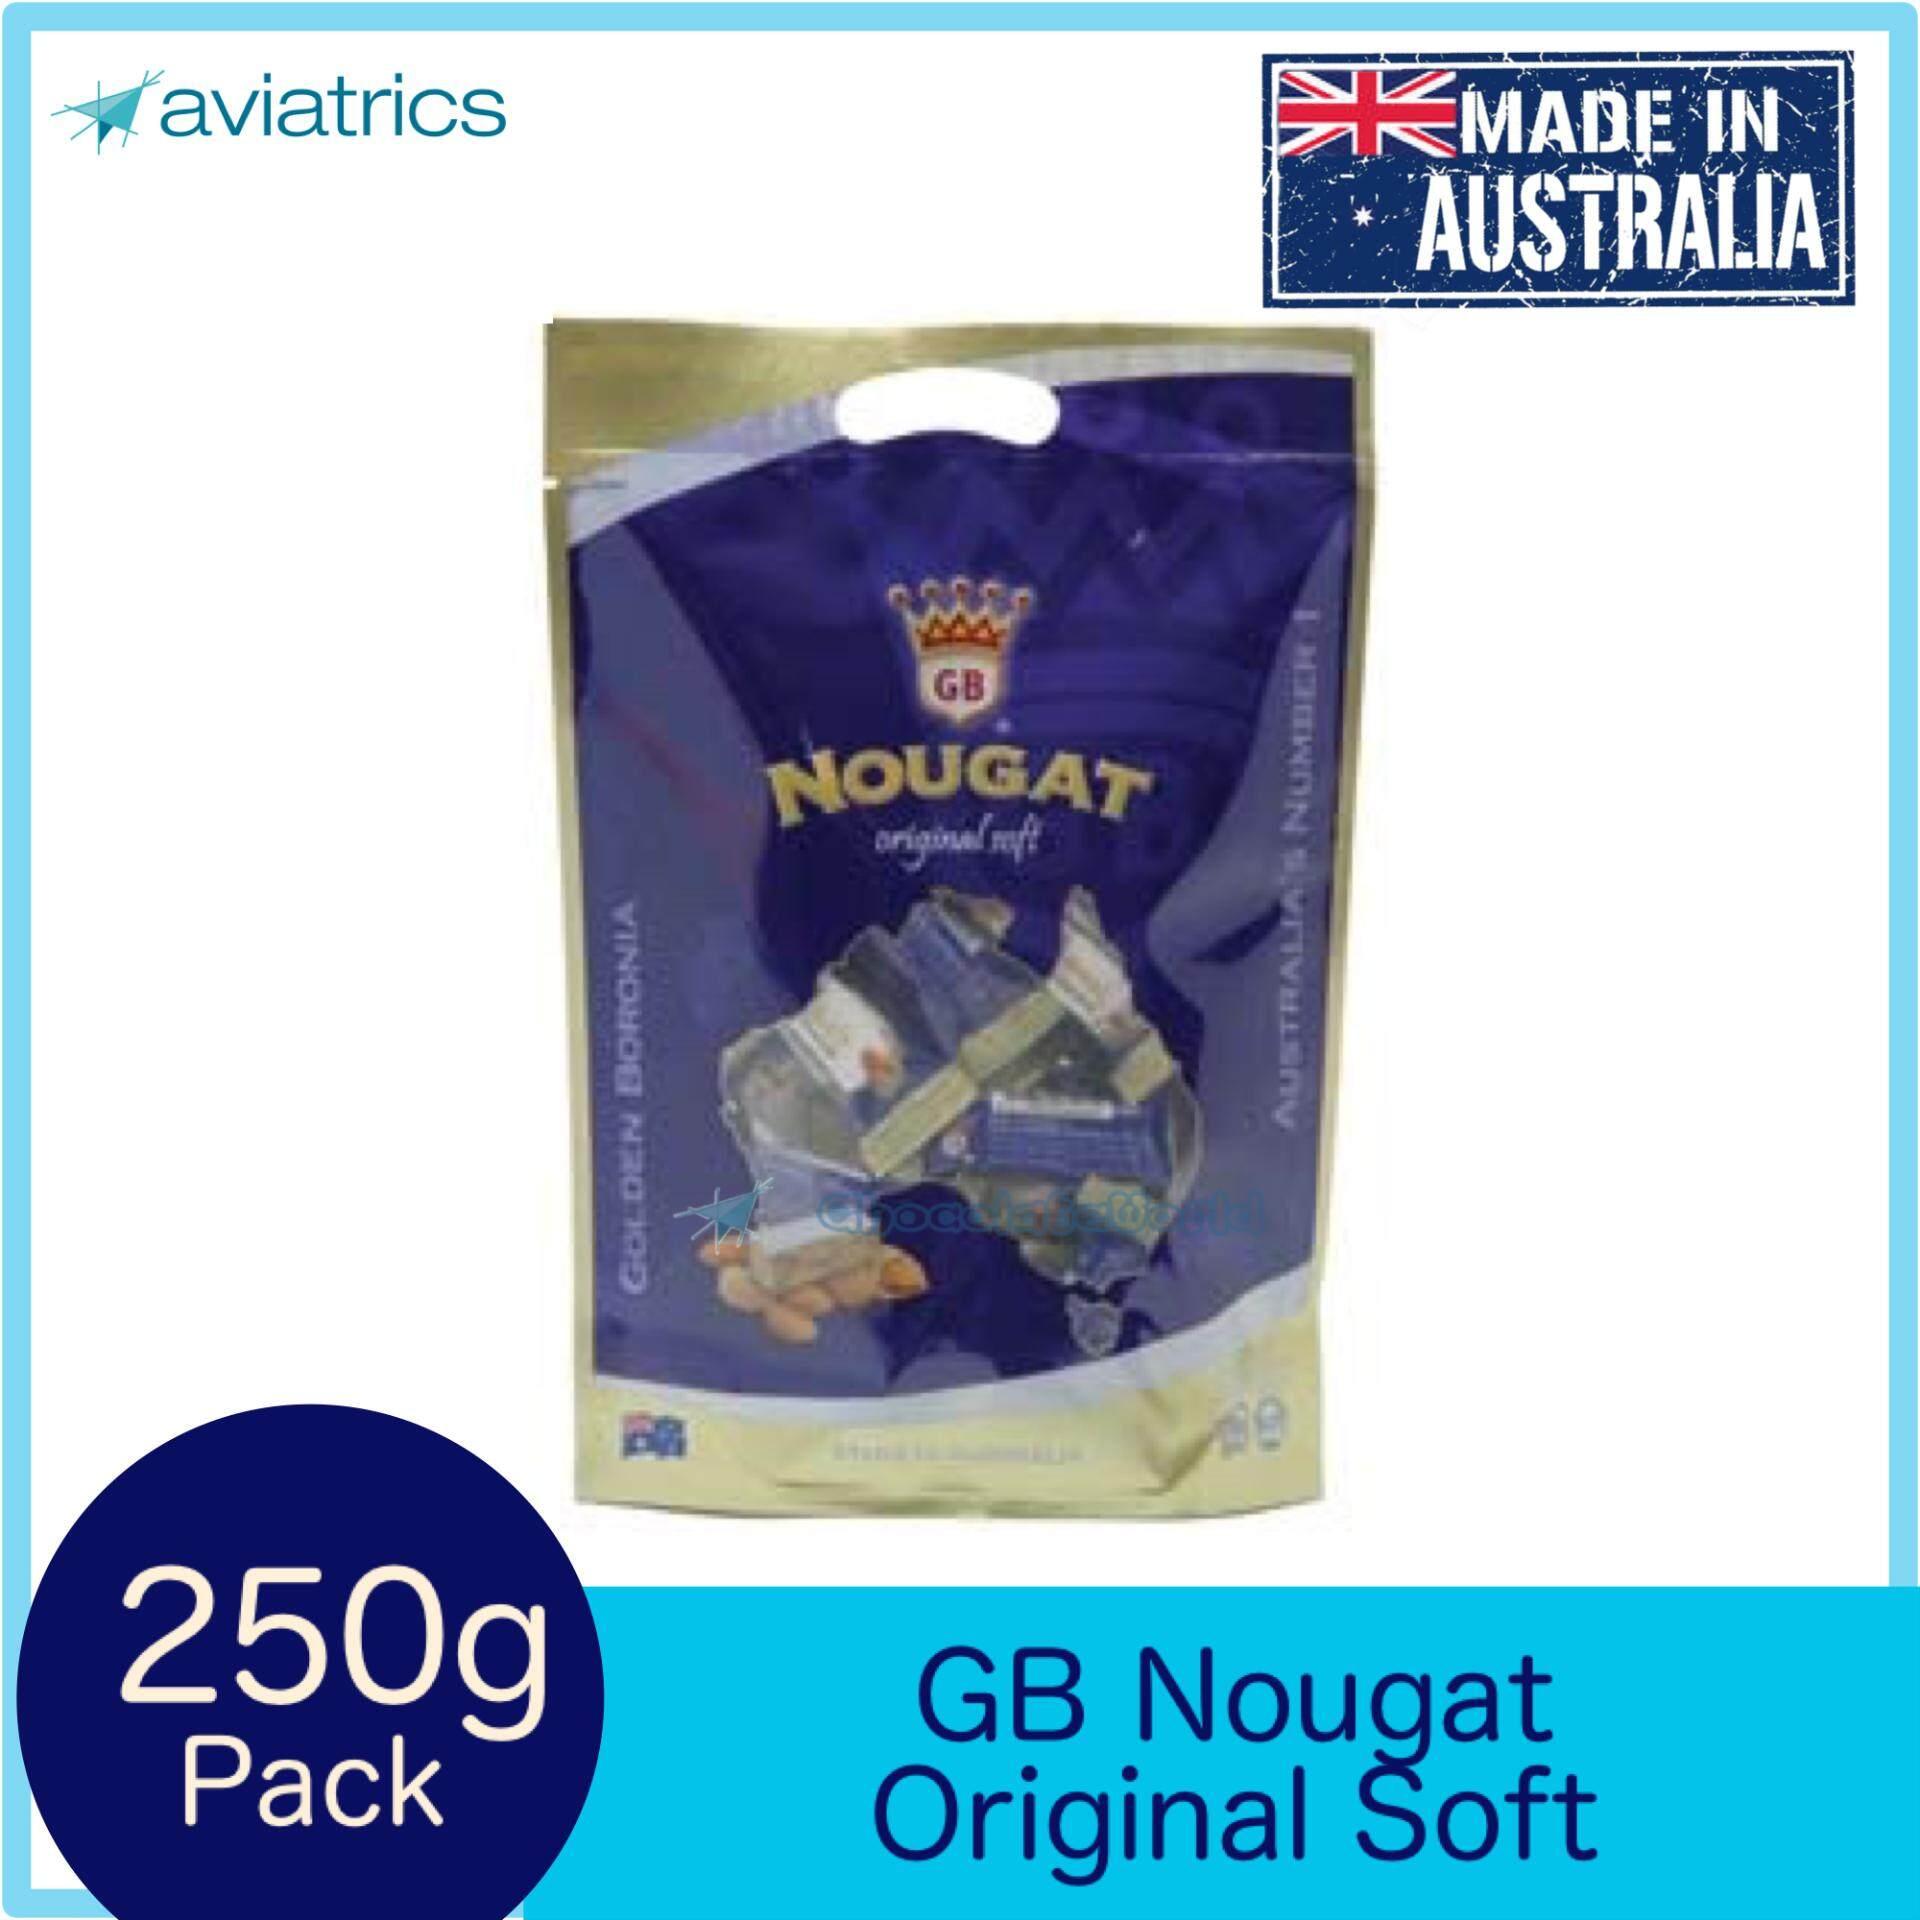 Golden Boronia Nougat Original Soft 250G (Made in Australia) 60fcede927